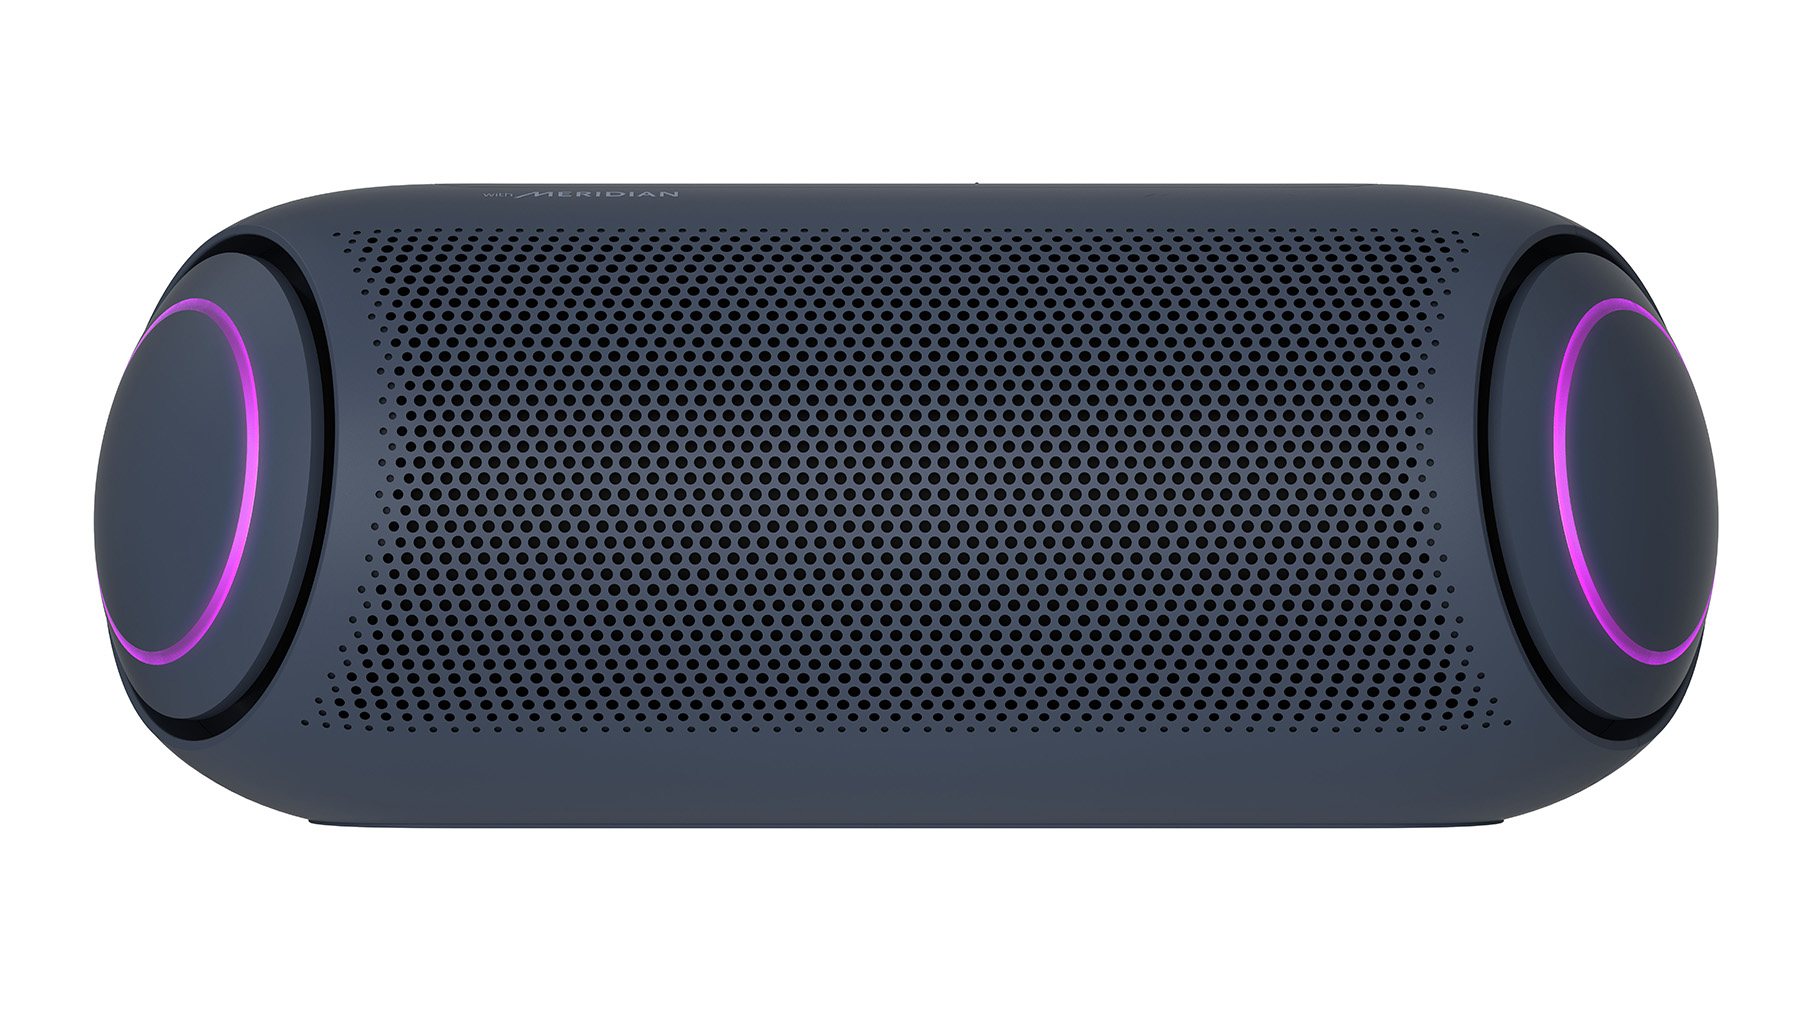 LG's latest Bluetooth speakers have passive radiators for extra bass #rwanda #RwOT MS-13